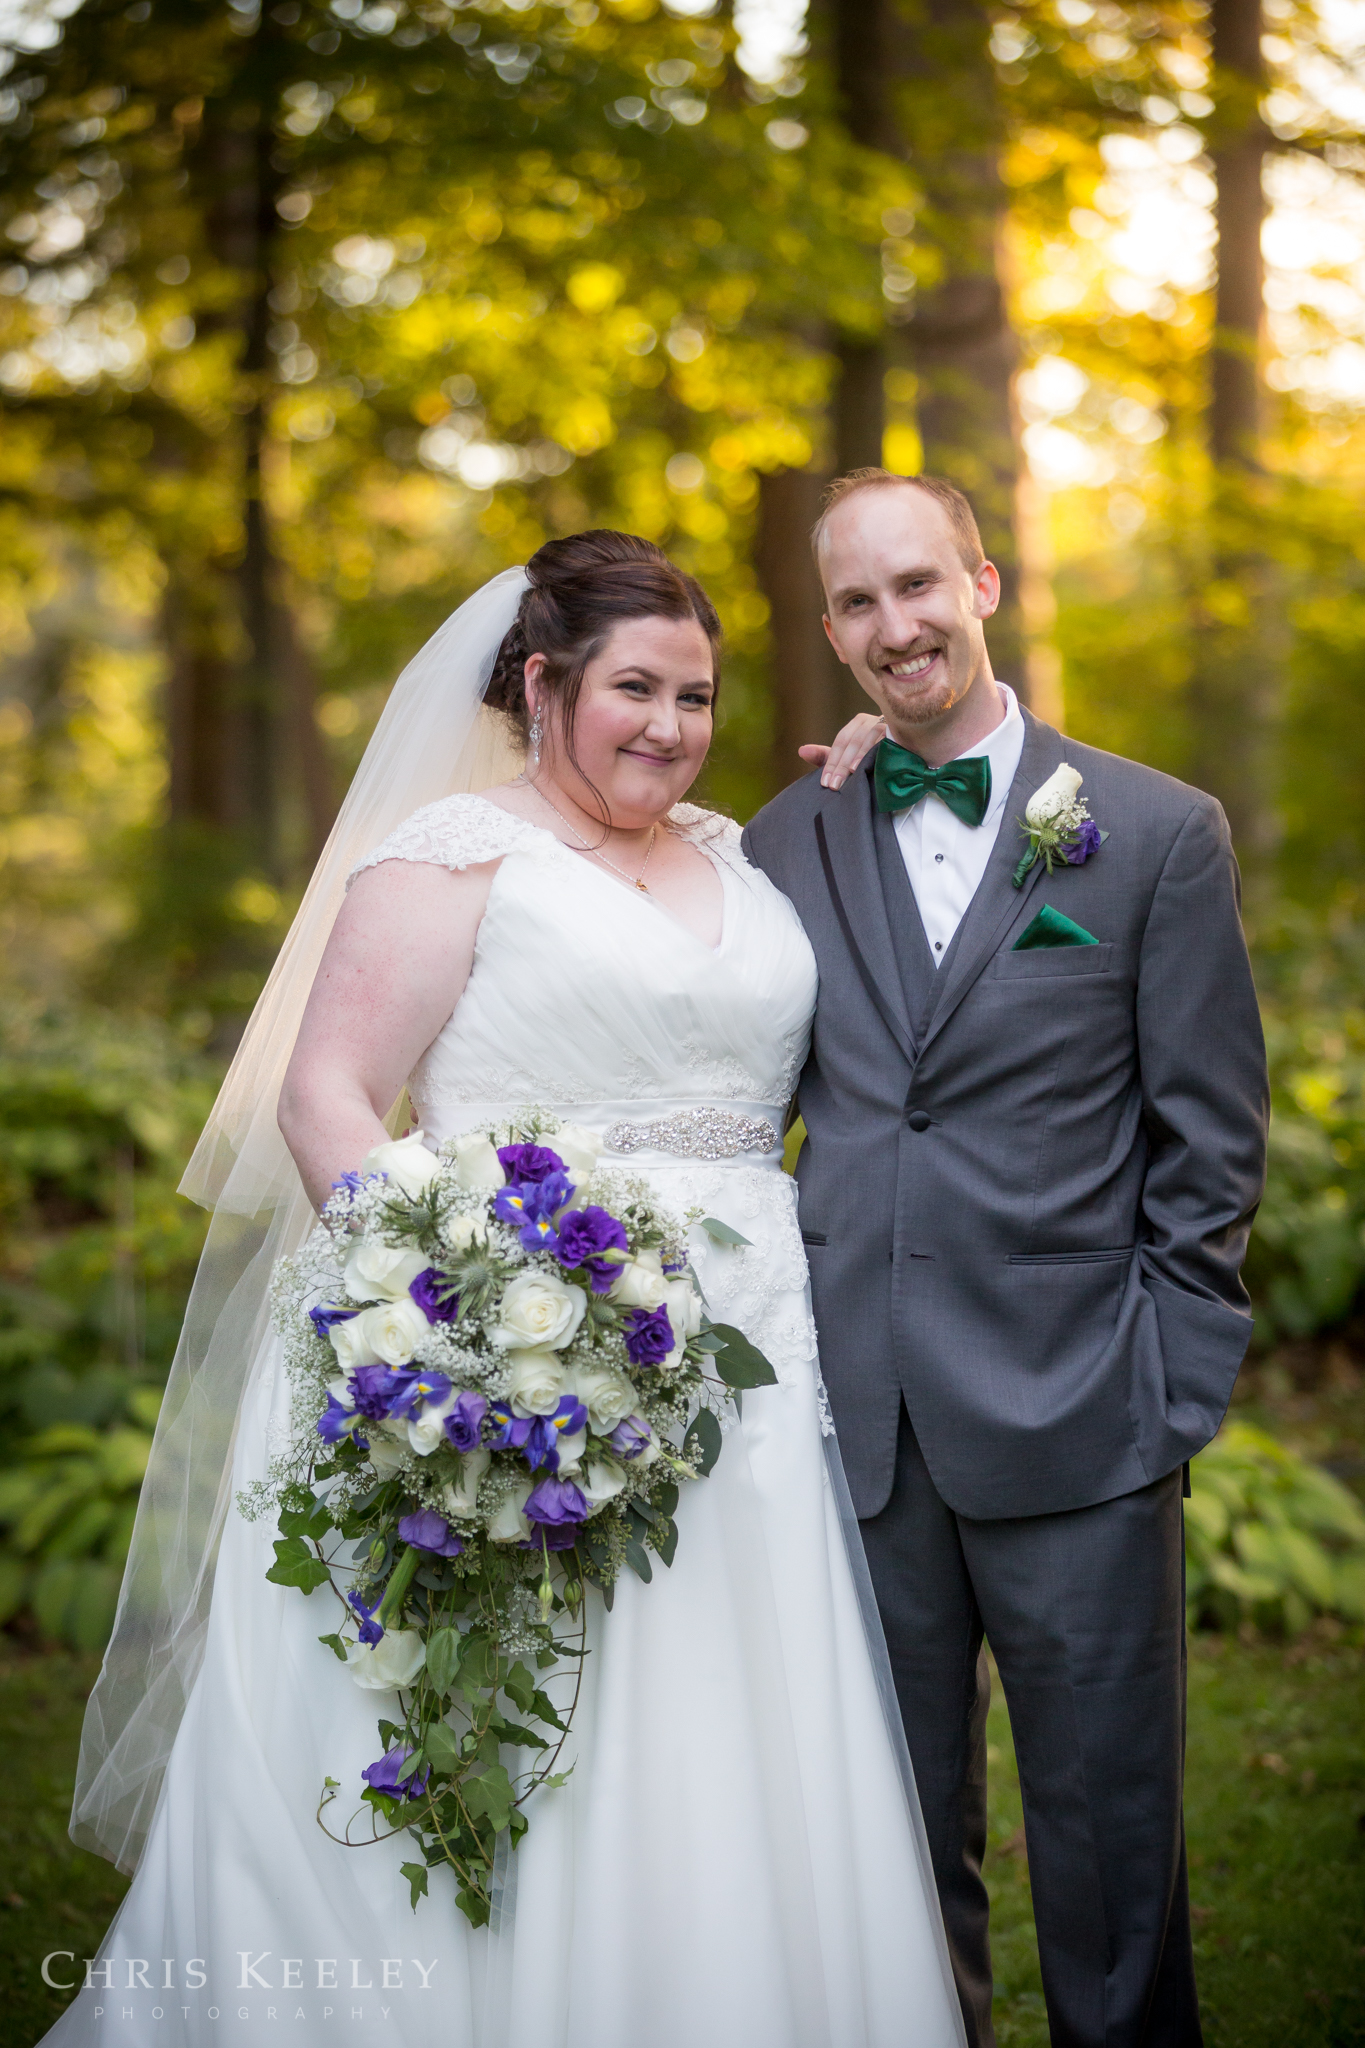 new-hampshire-wedding-photographer-three-chimneys-inn-chris-keeley-photography-23.jpg